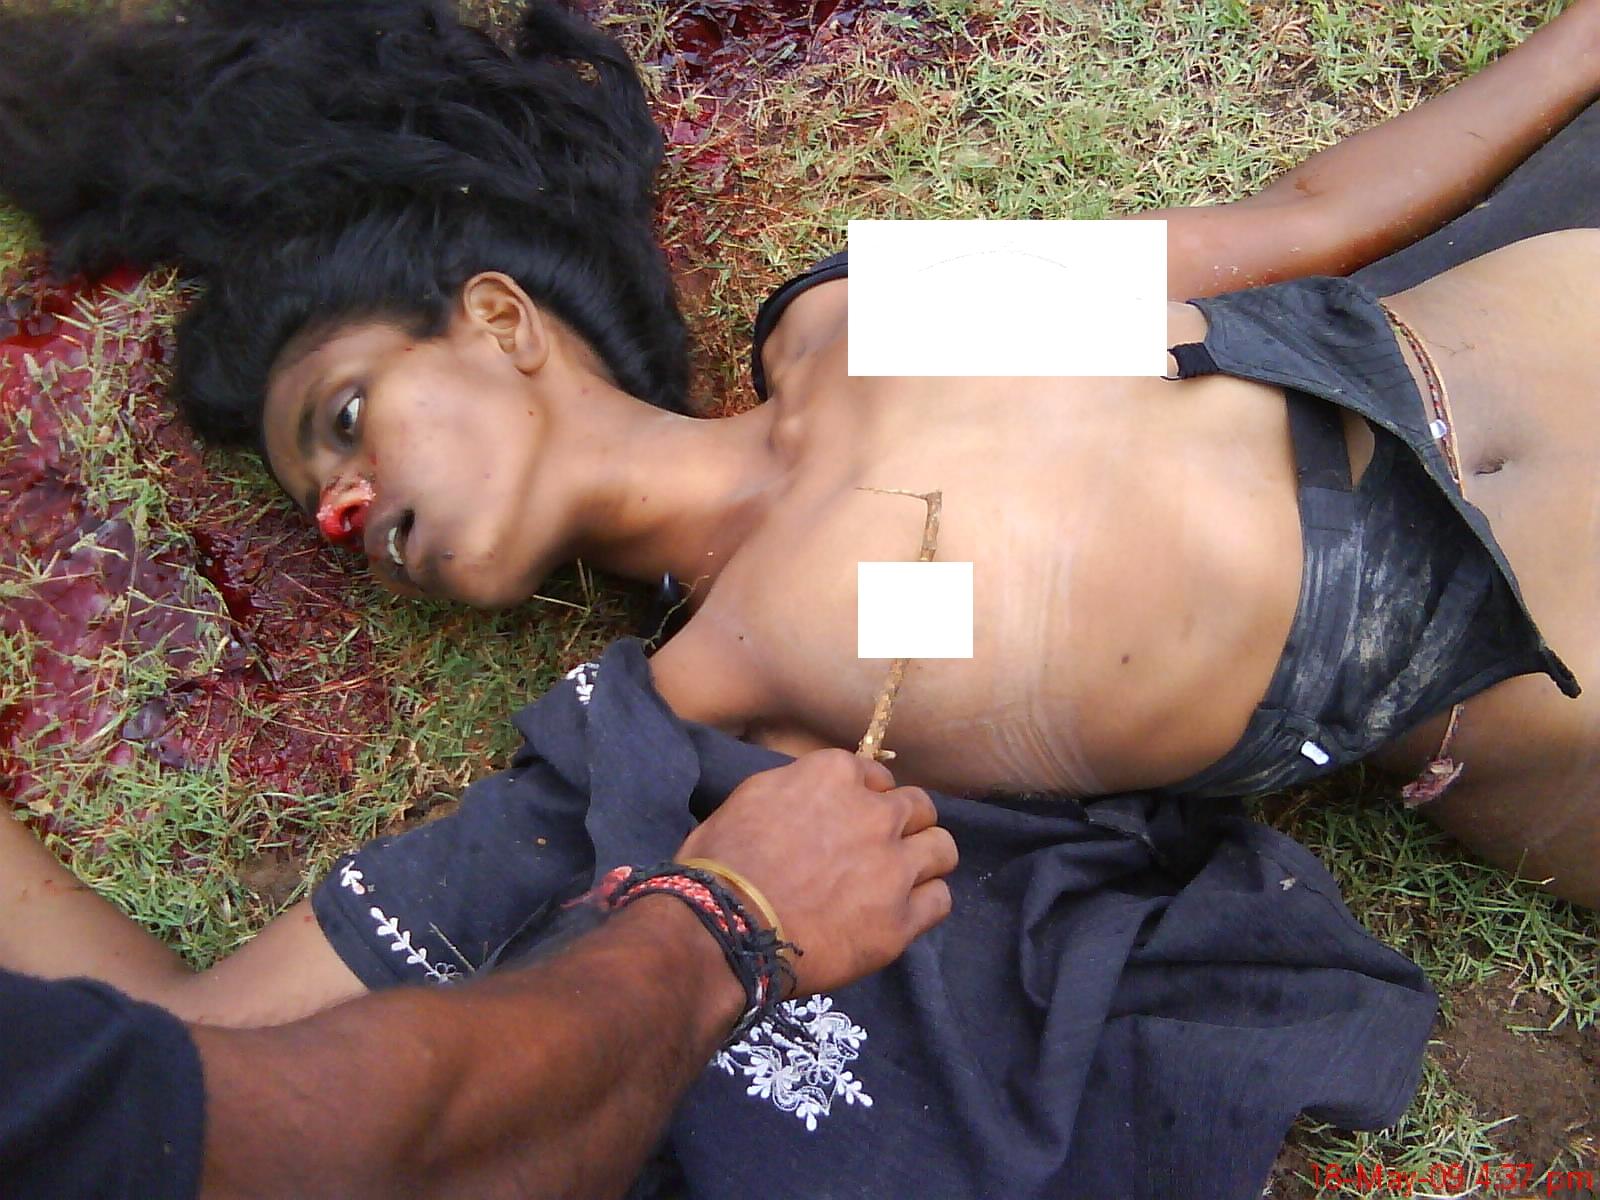 Disturbing Images Of war Crimes: Rape And Killings | Colombo Telegraph: colombotelegraph.wordpress.com/2012/03/09/disturbing-images-of-war...